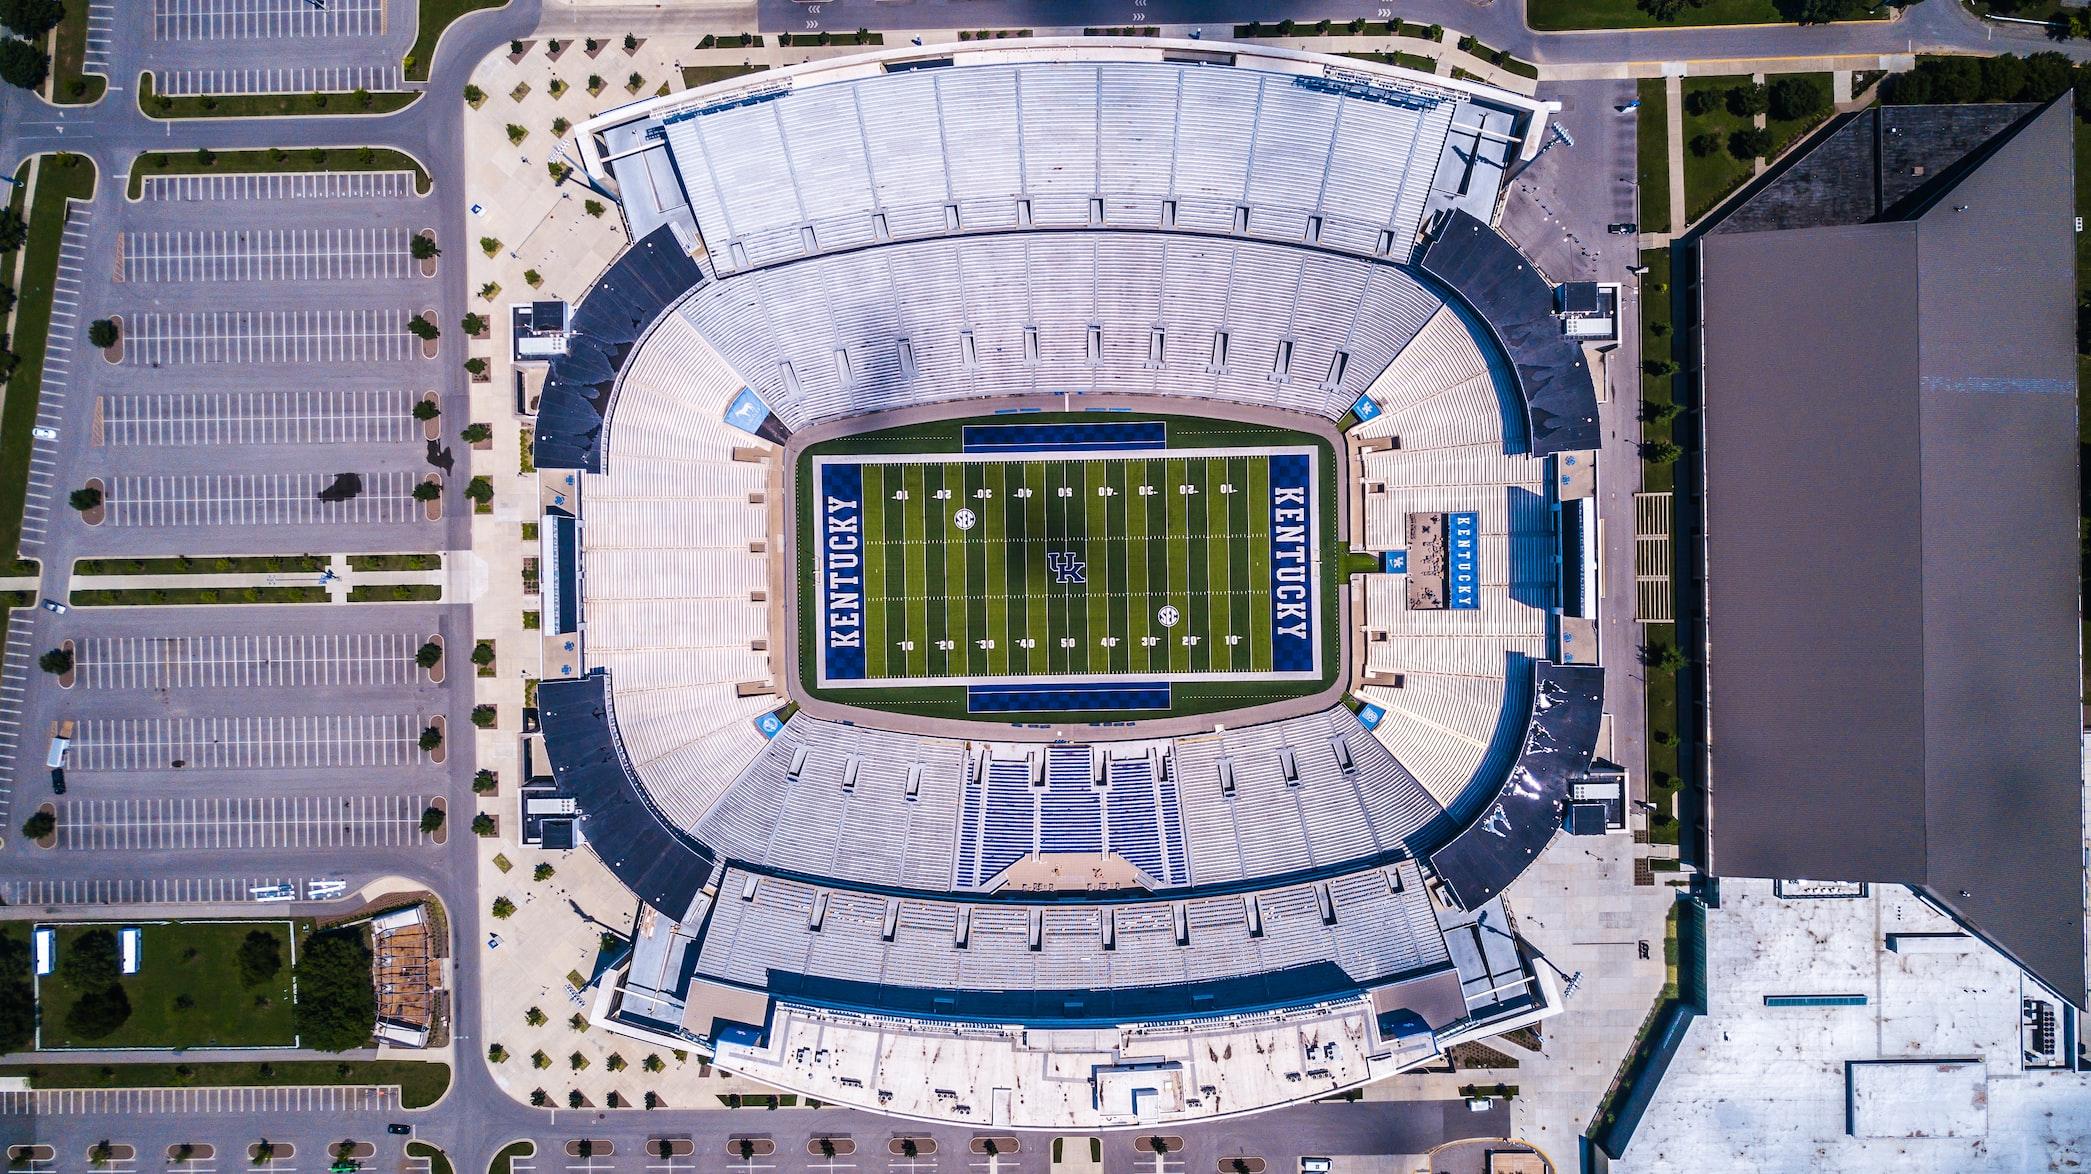 arial view of the Lexington, KY football stadium